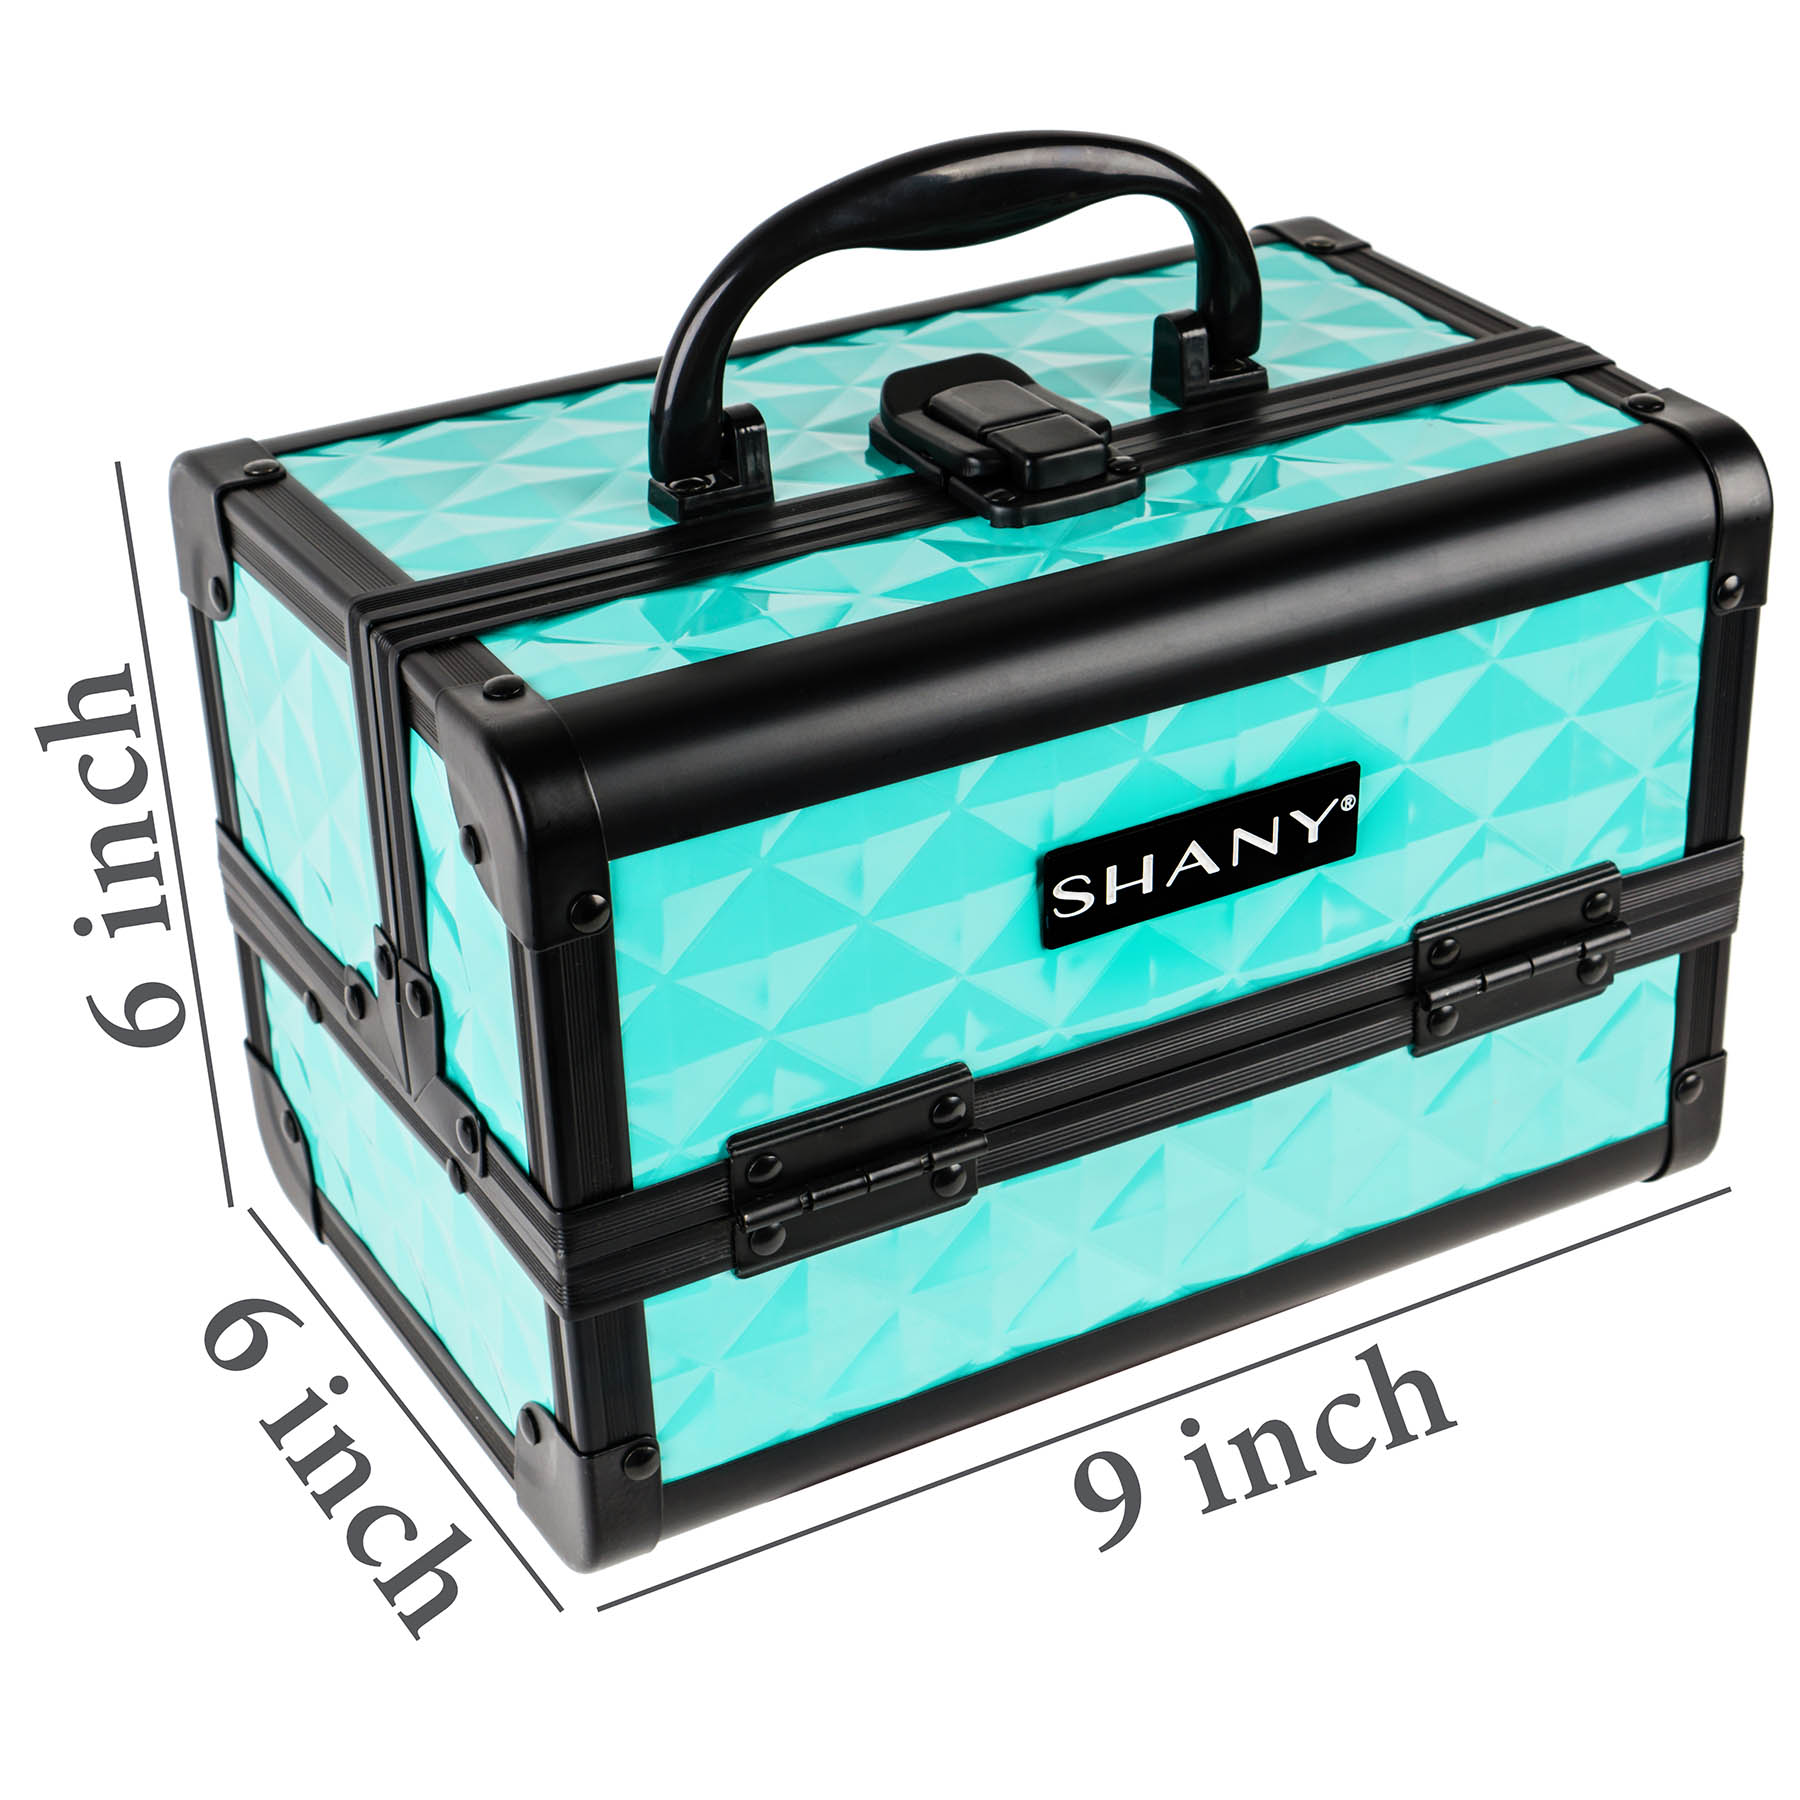 SHANY-Mini-Makeup-Train-Case-With-Mirror miniature 79